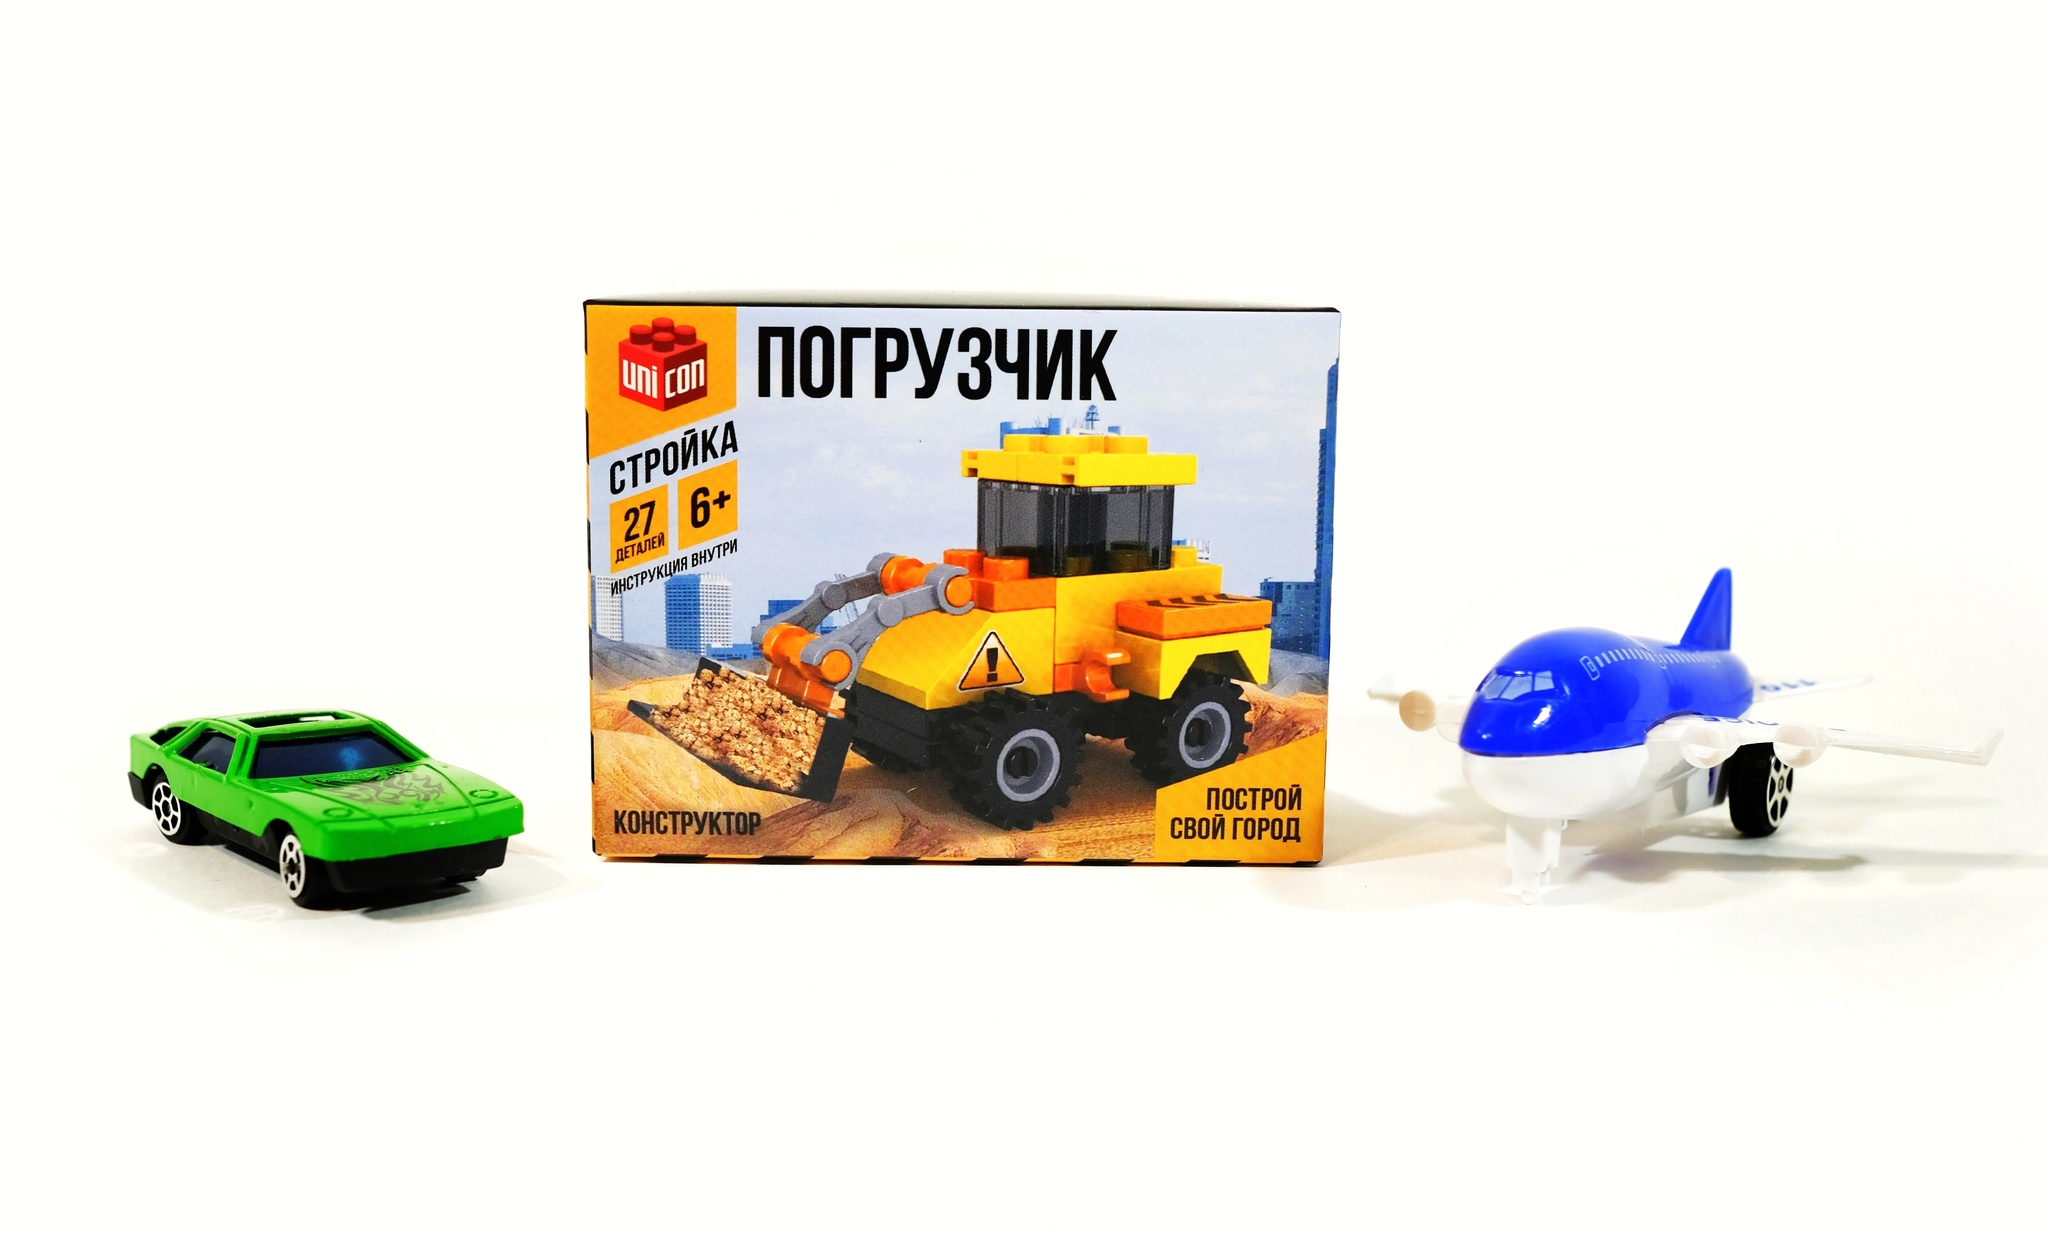 мини игрушки в дорогу